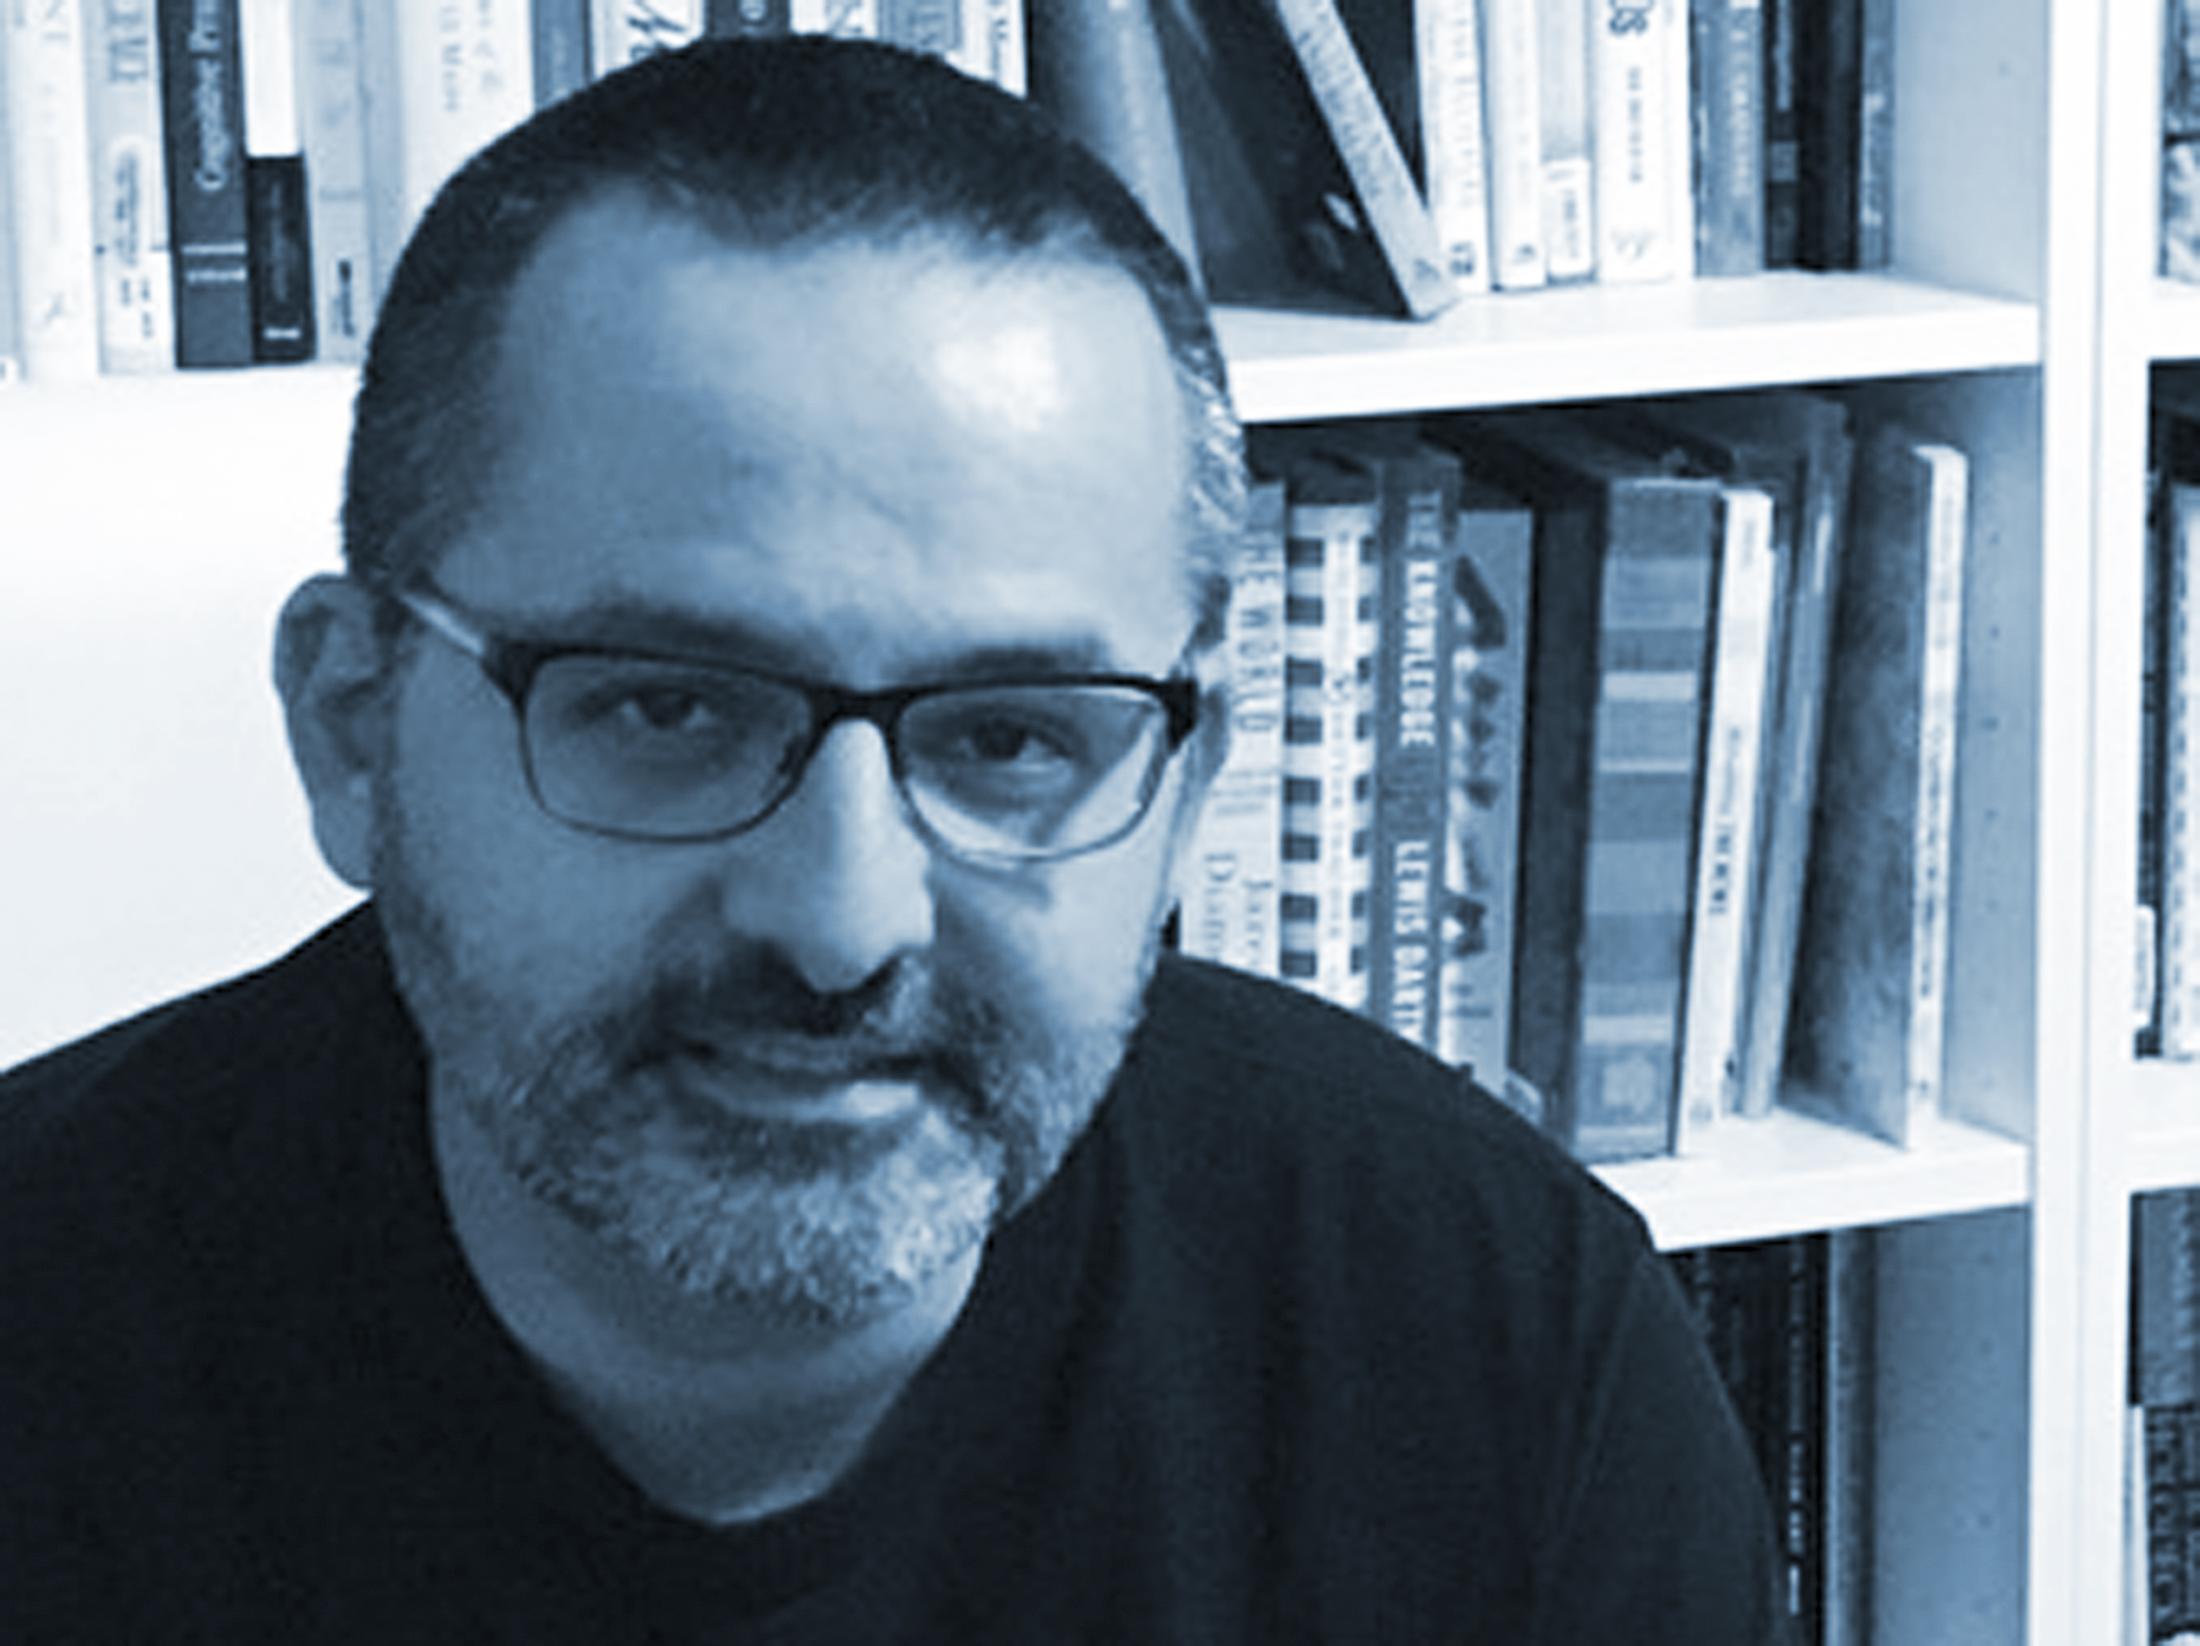 AlbertoCairo2.jpg